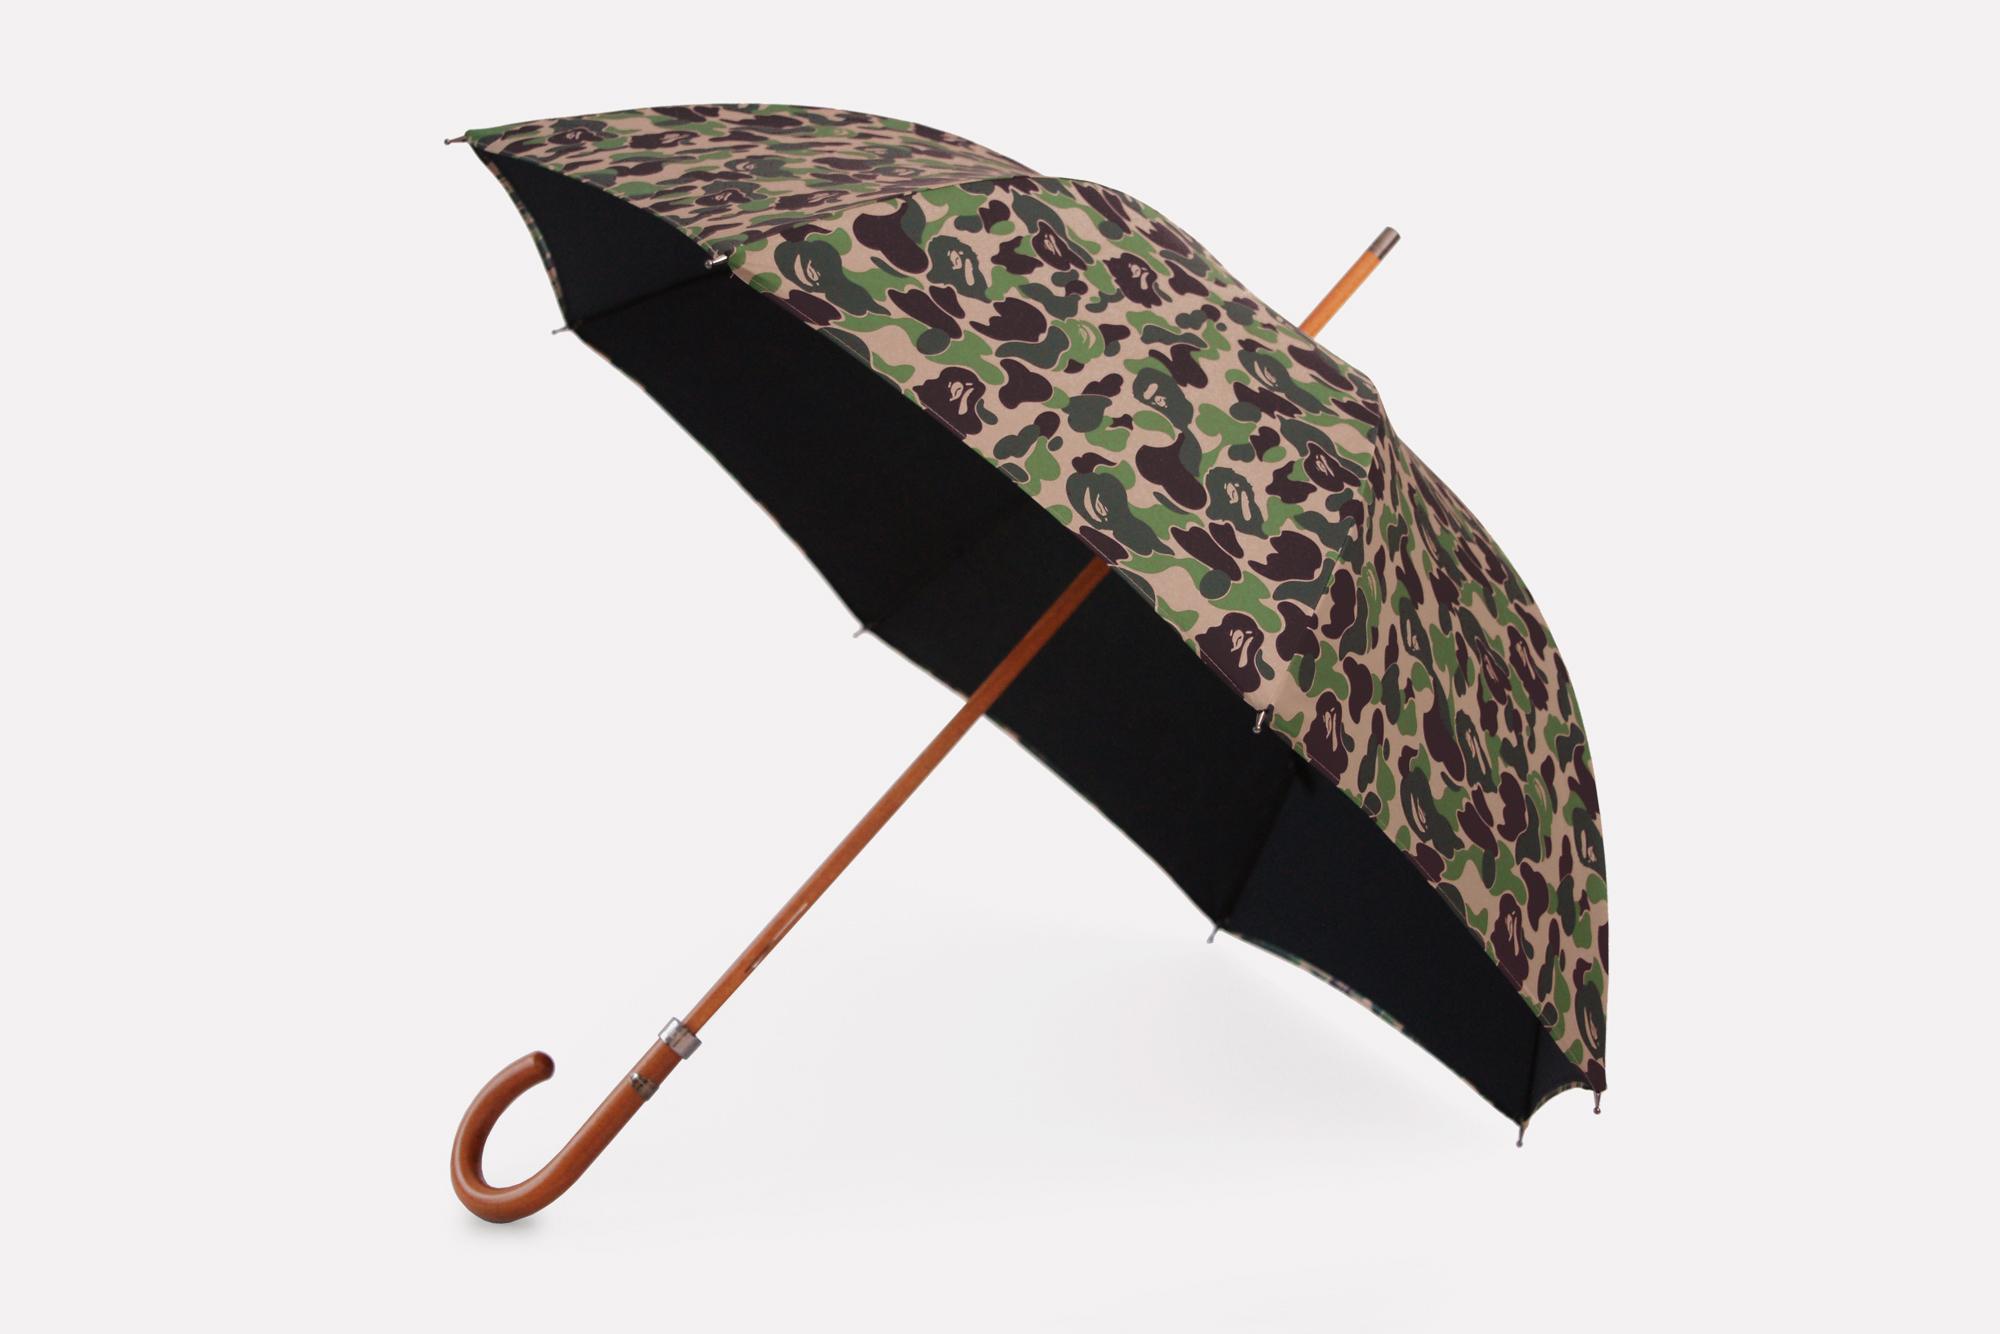 Mr. Bathing Ape x London Undercover ABC Camo Umbrella